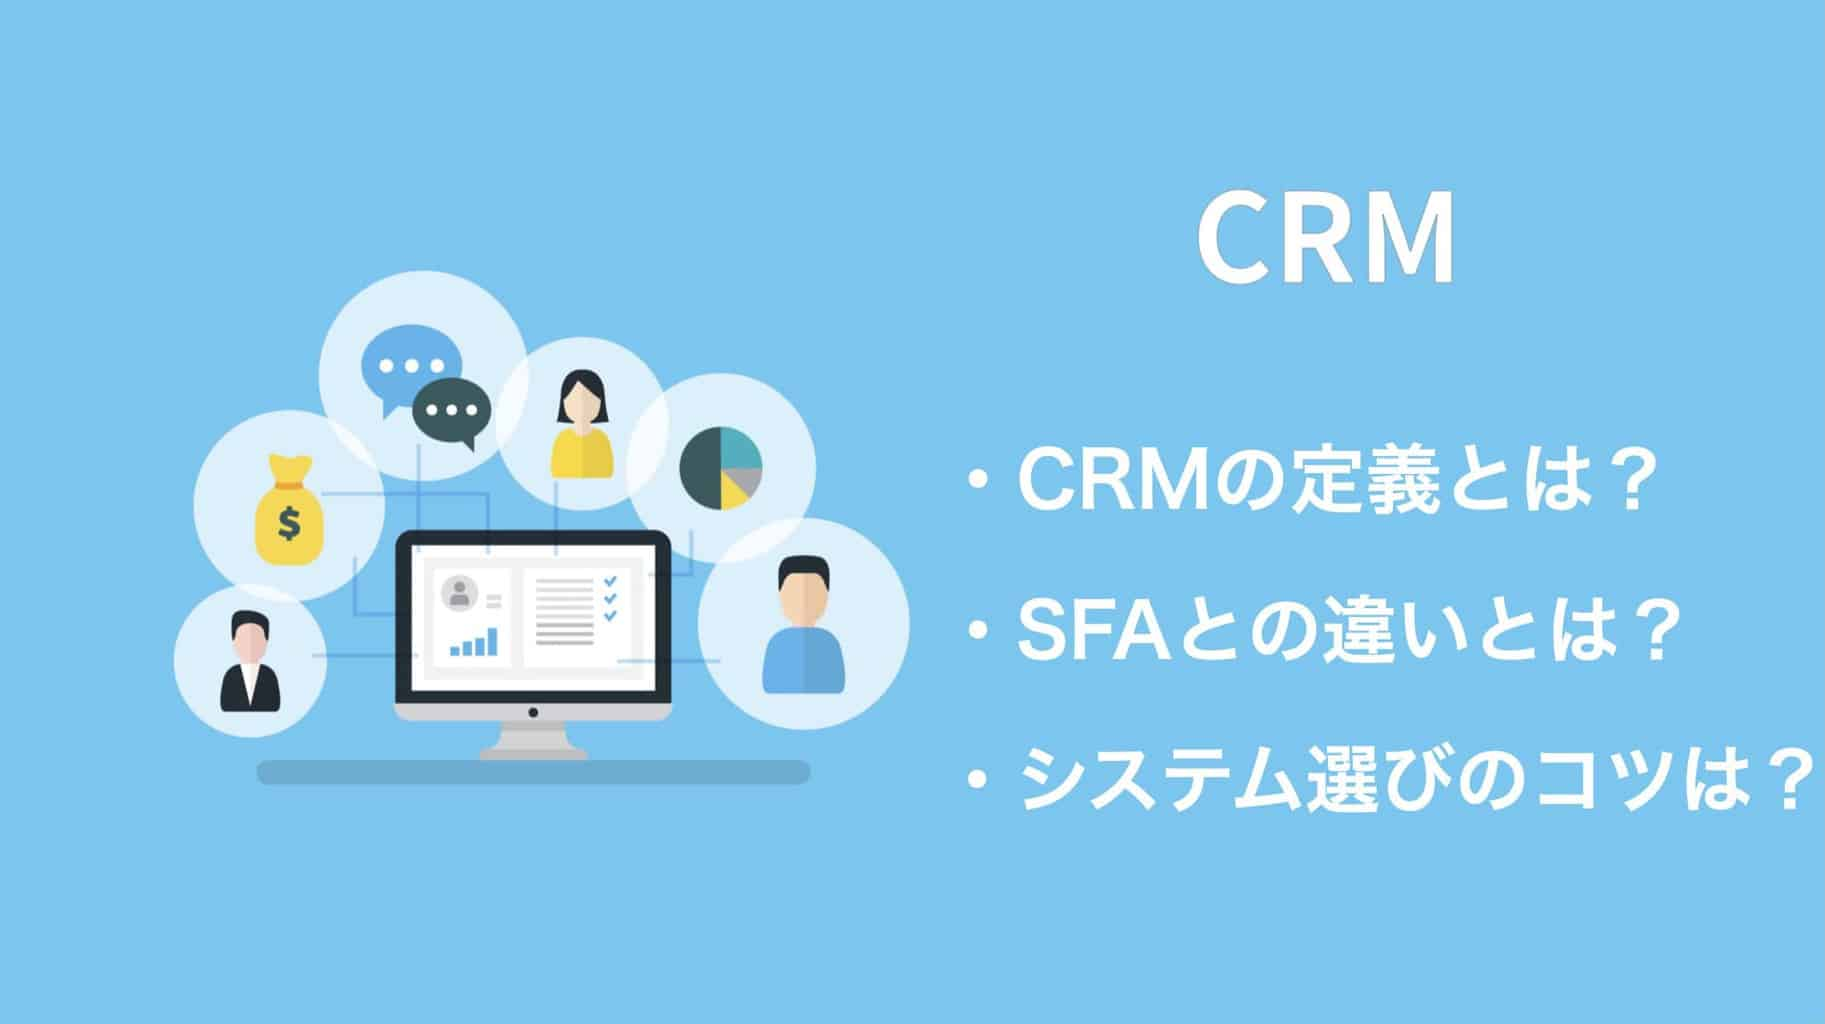 CRMの定義とは?必要とされる背景や具体例を解説!